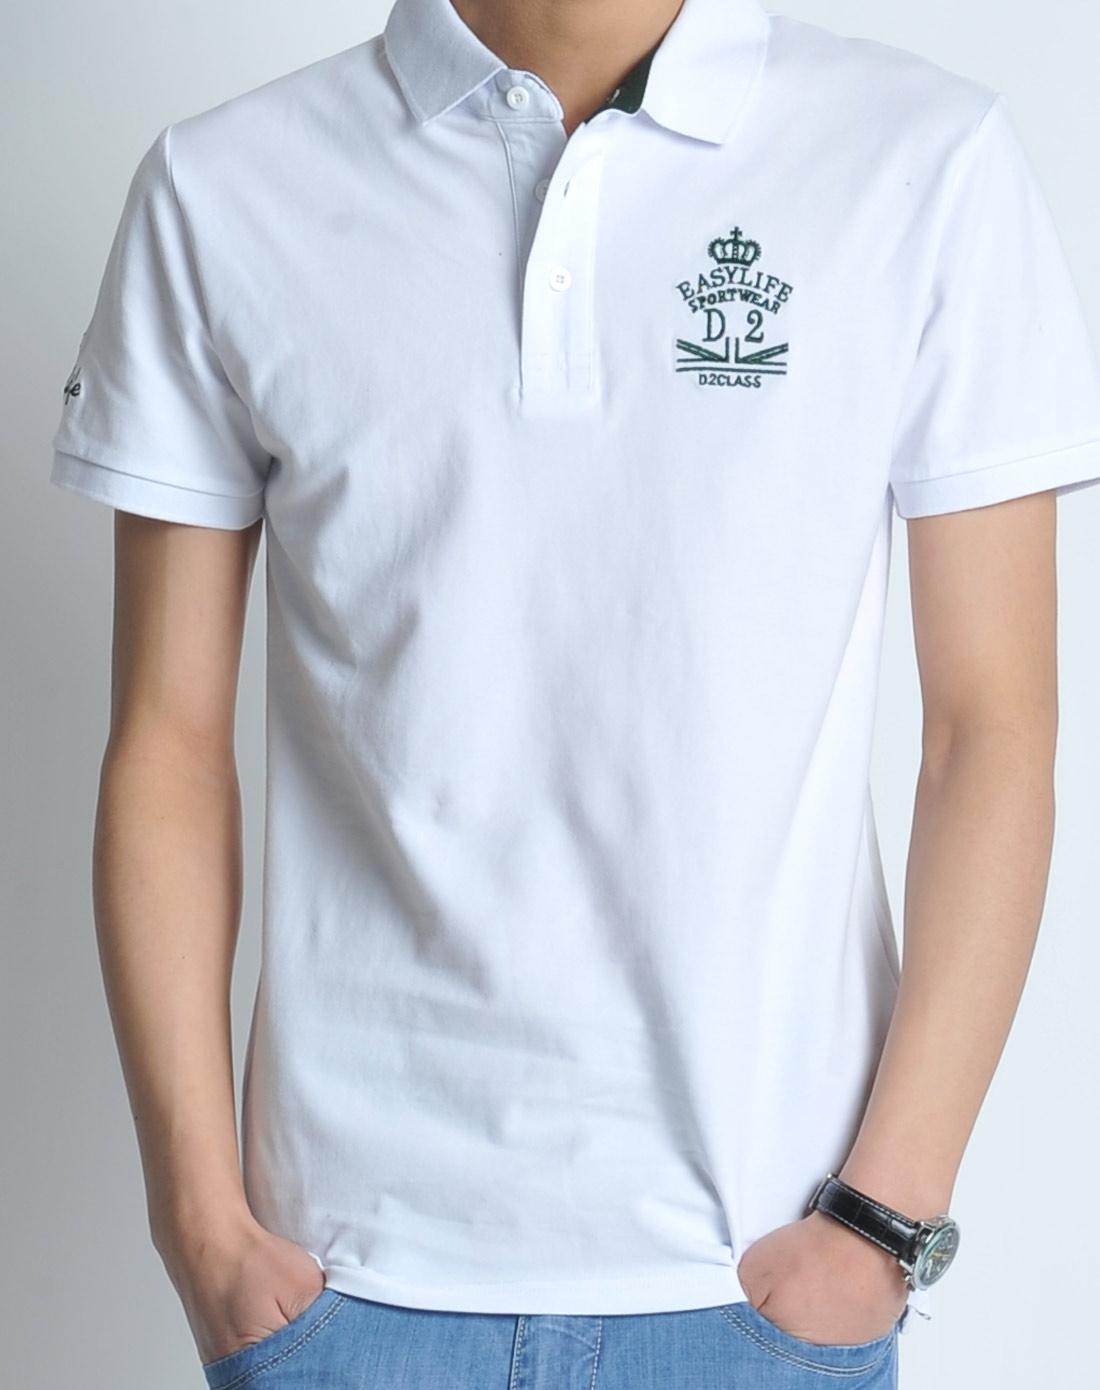 T恤男短袖韩版男士短袖t恤潮男上衣服运动套装